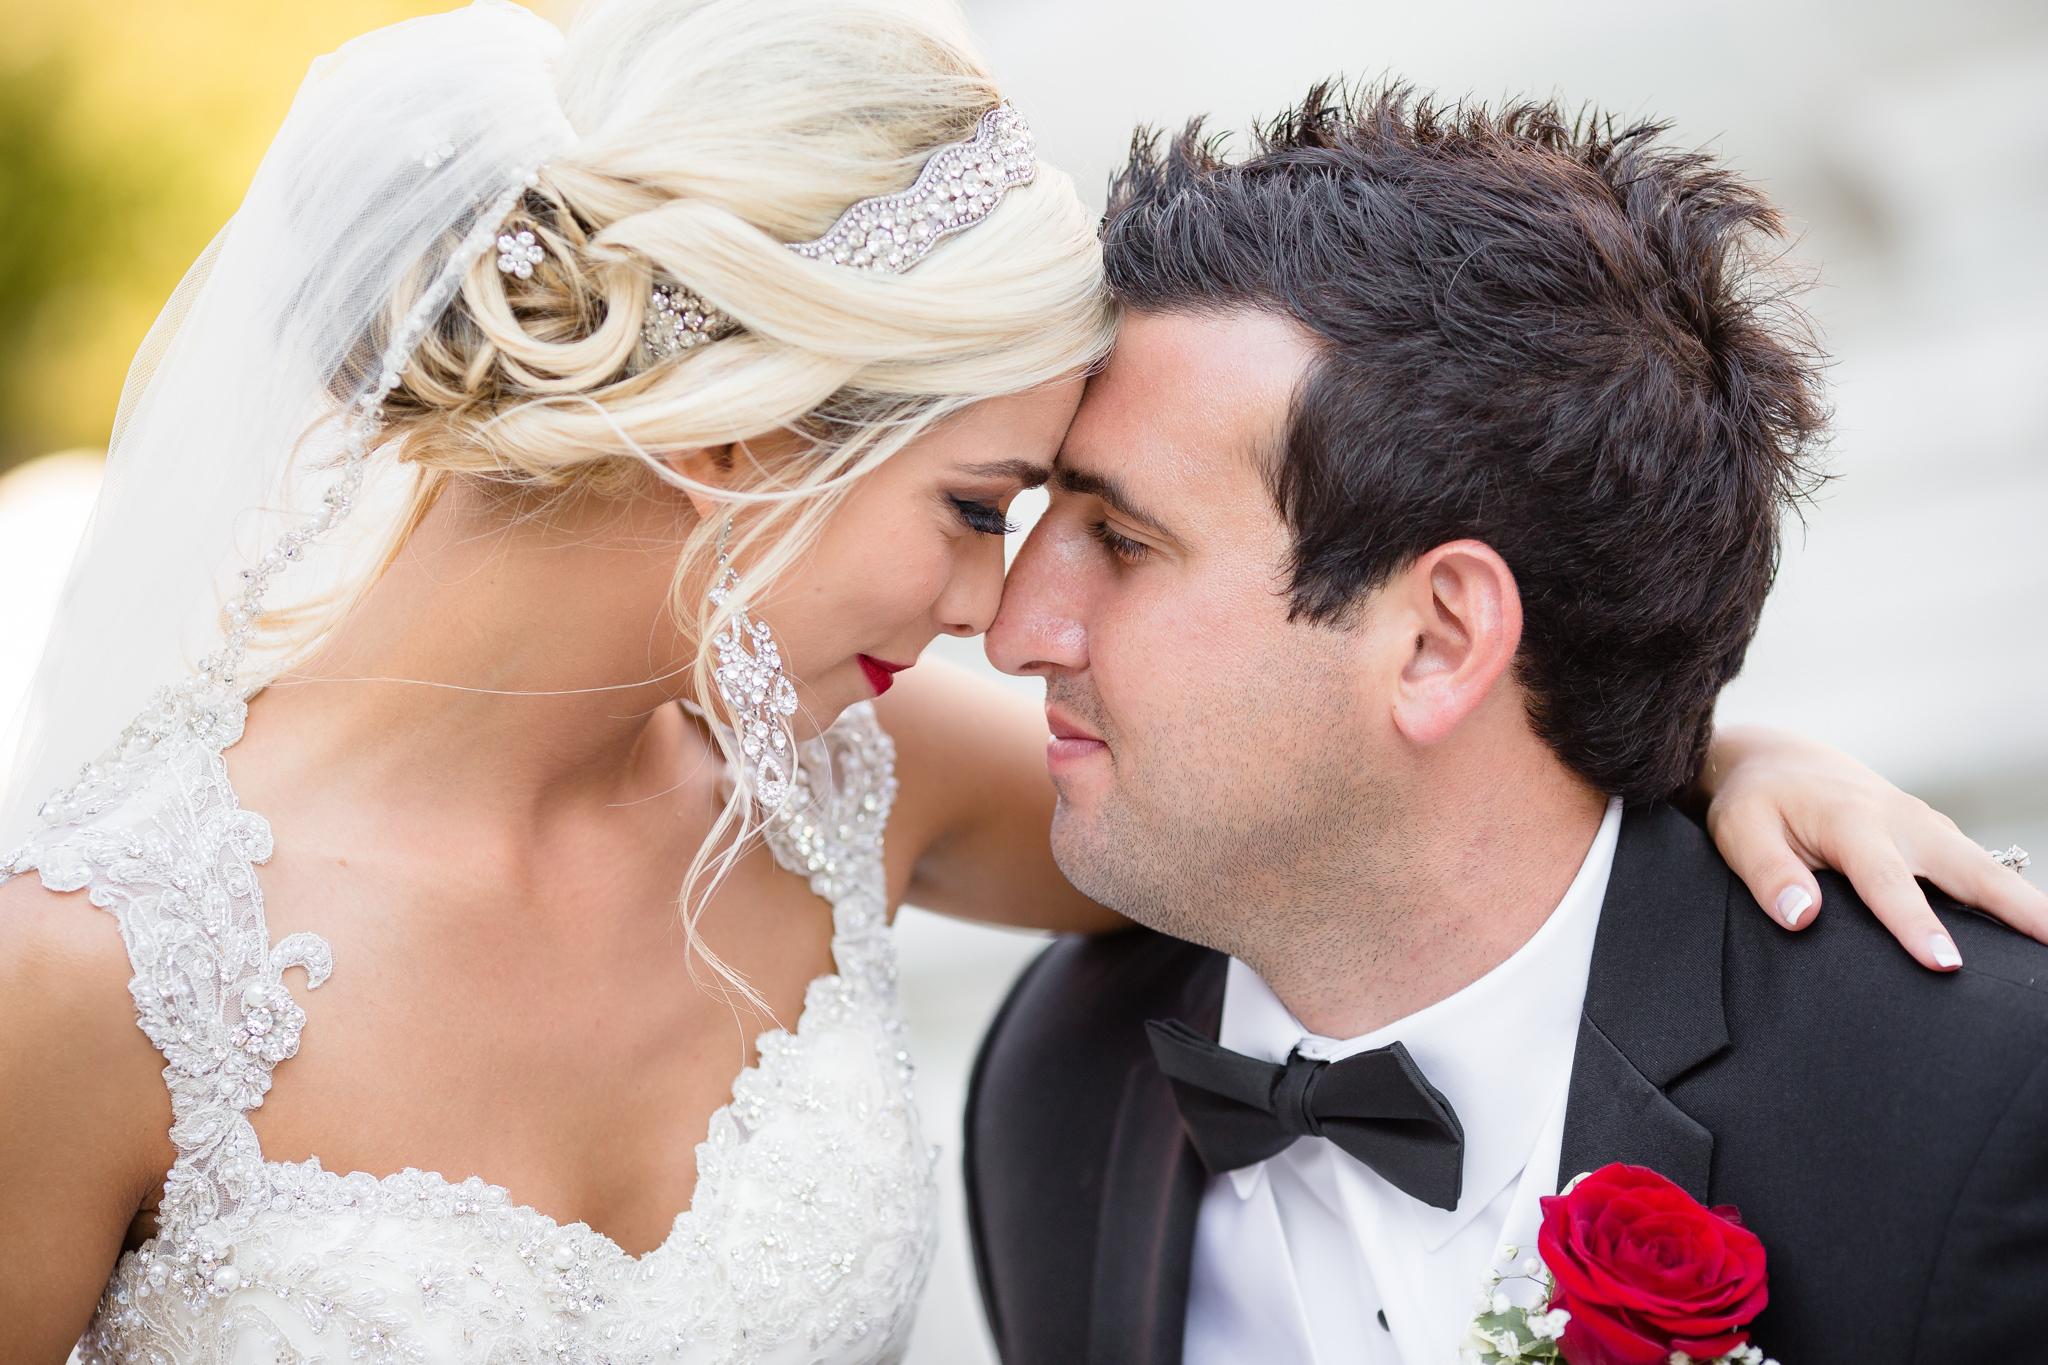 Statler-City-Buffalo-wedding-photographer- 0458.jpg